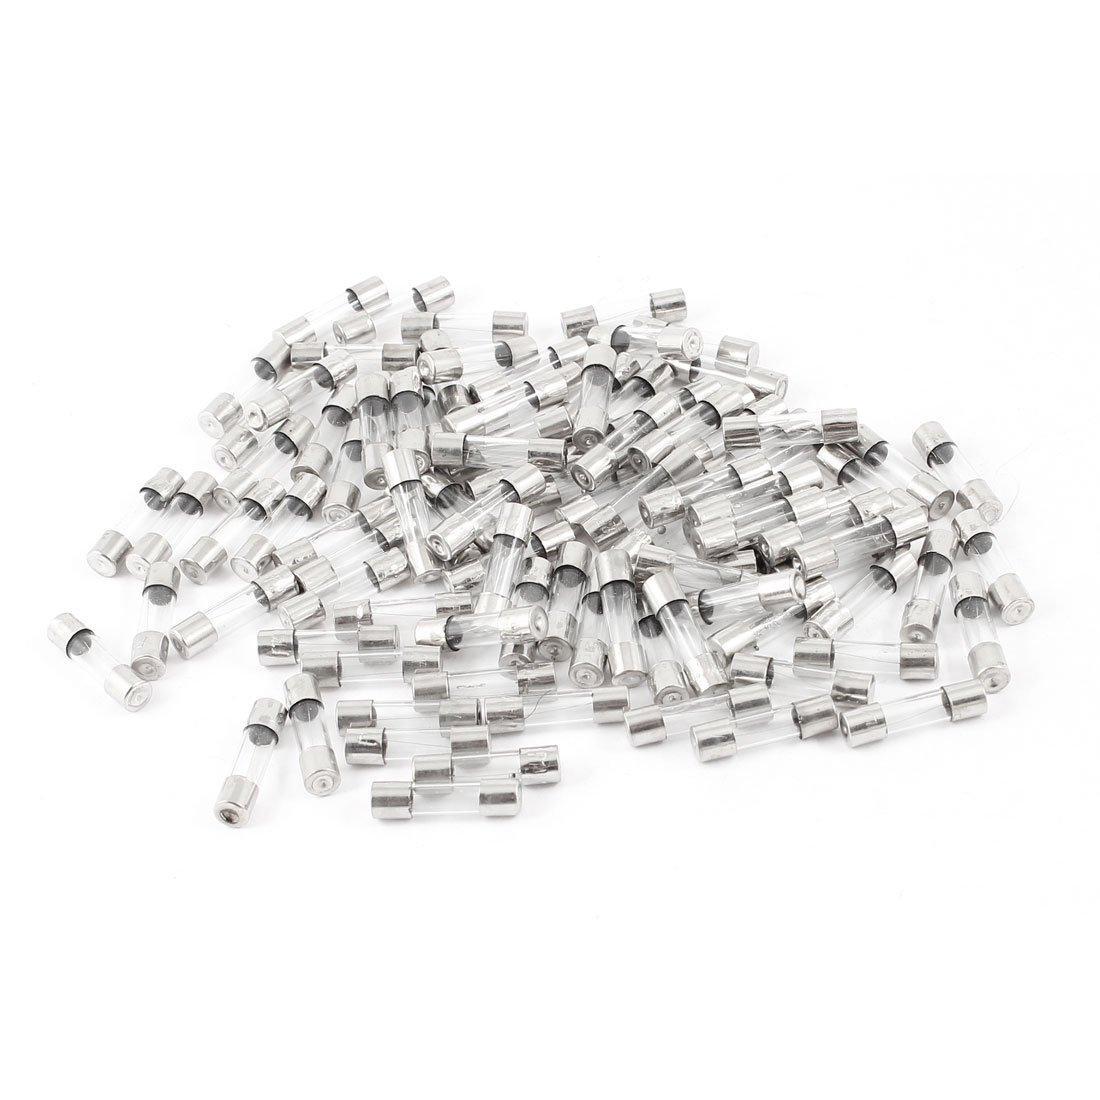 100 Pcs 5x20 Fast Blow Glass Fuse 5mm x 20mm 250V Fast Blow Fuses